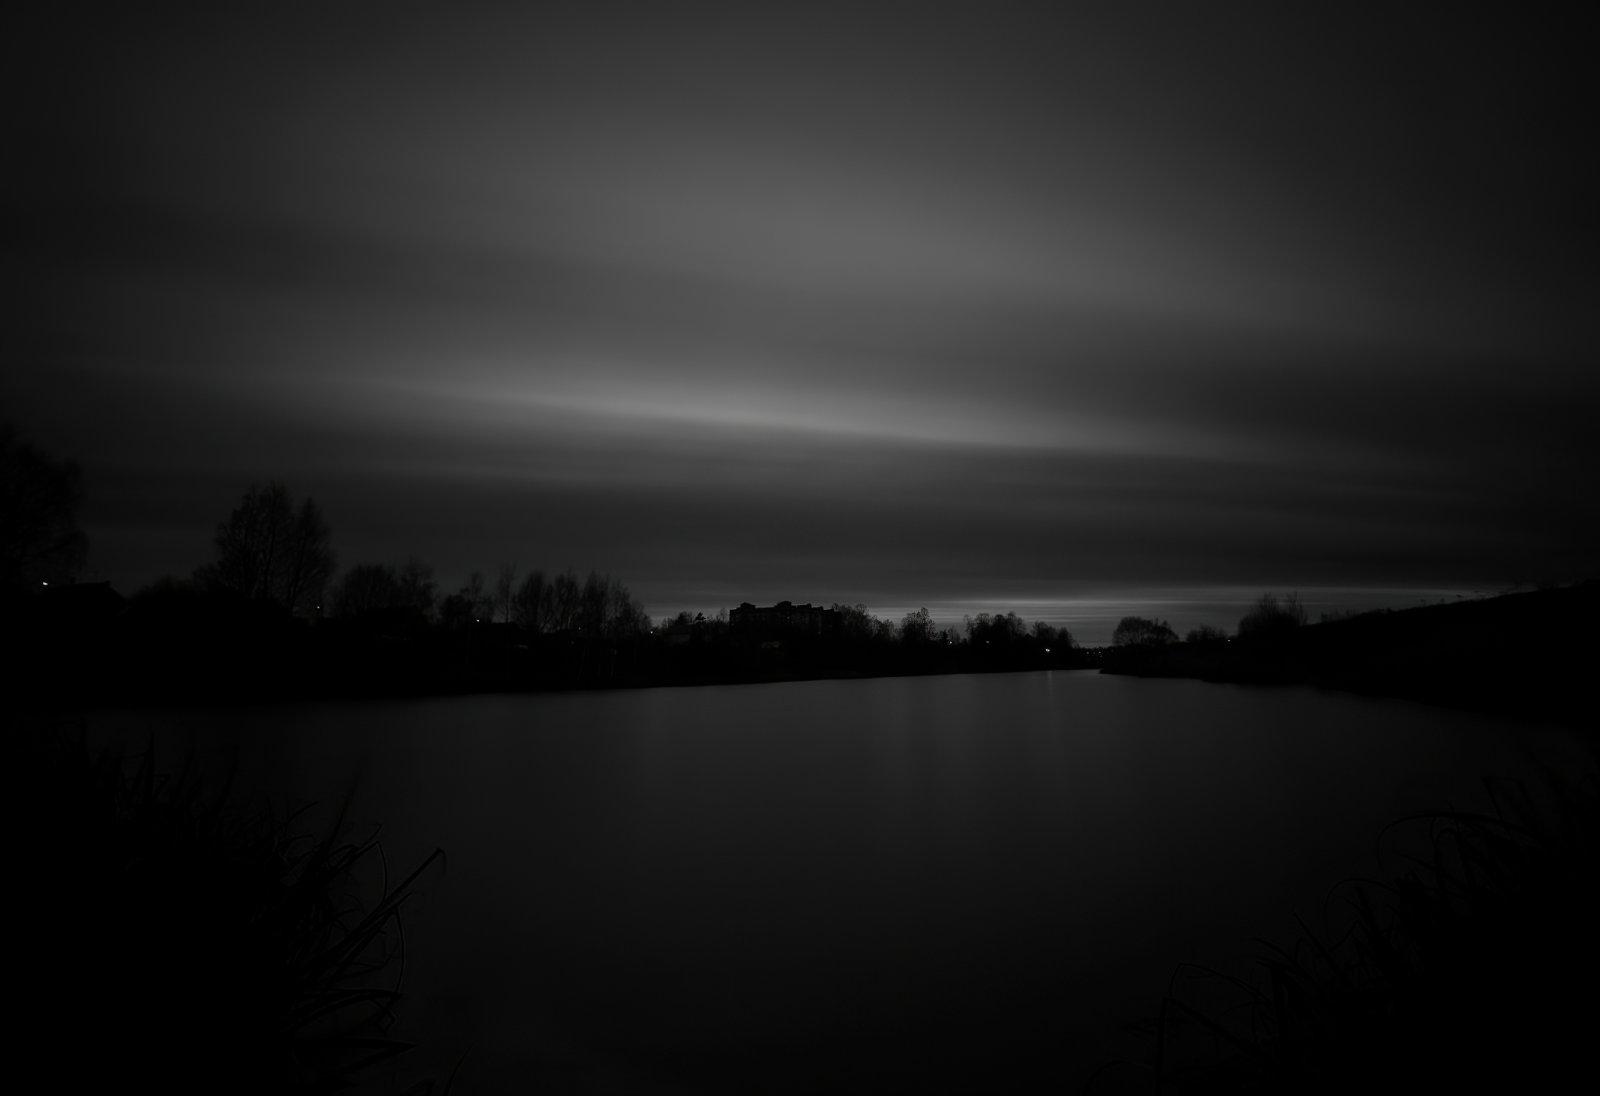 Пейзаж в темном ключе